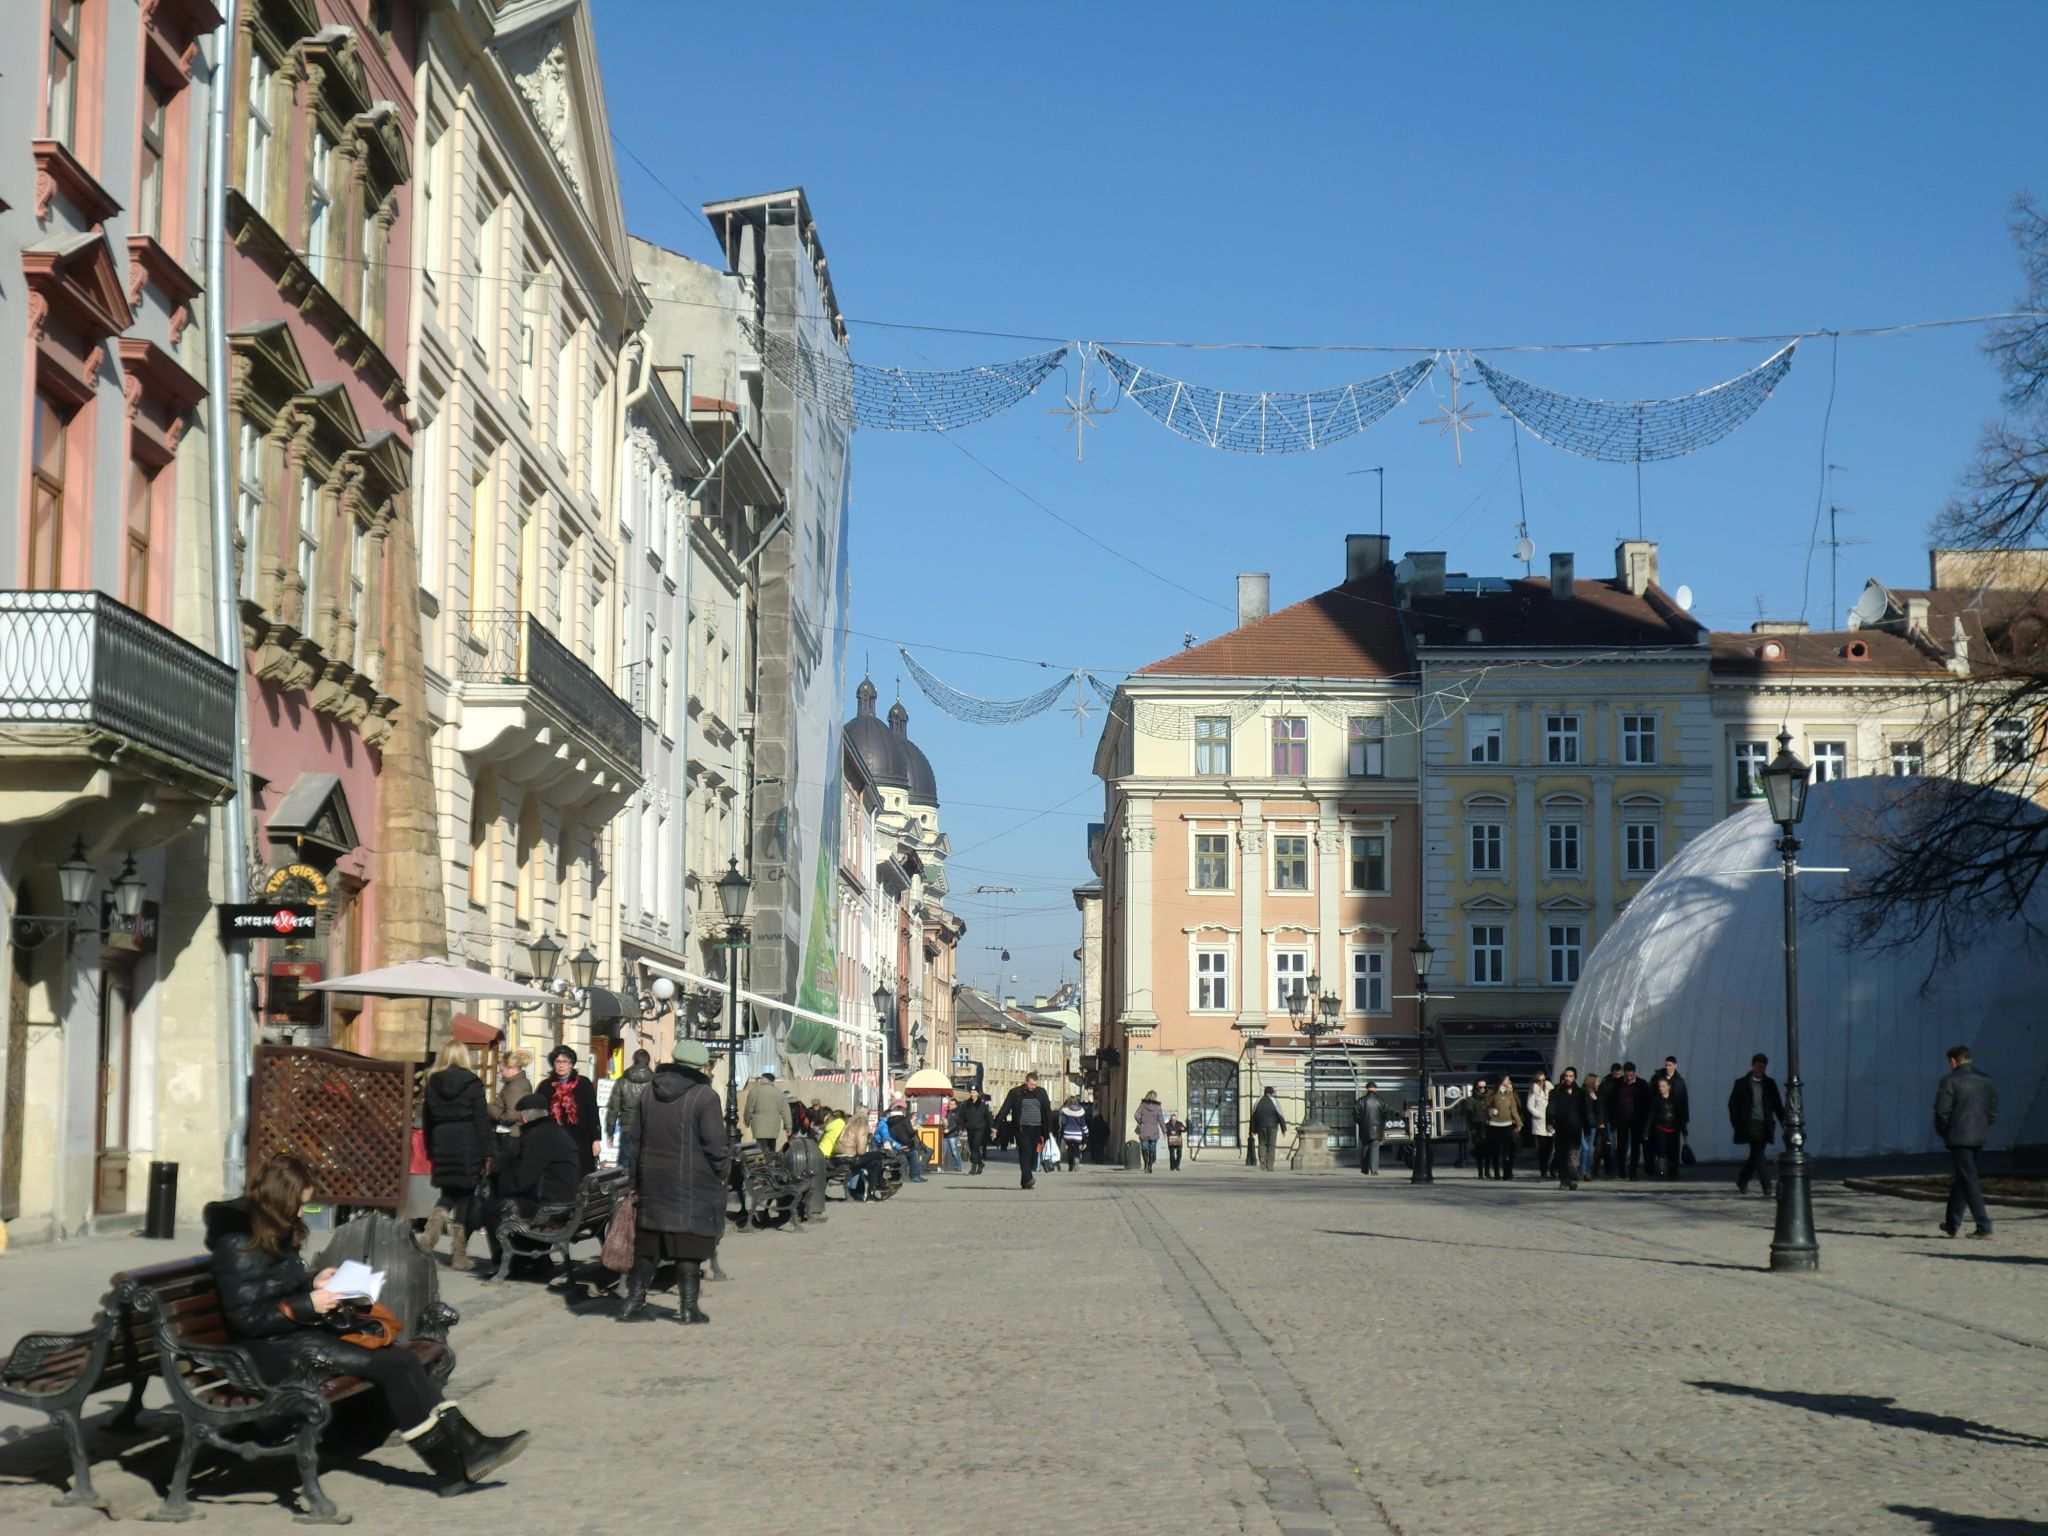 Lviv 16 - Lviv, the Ukrainian pearl